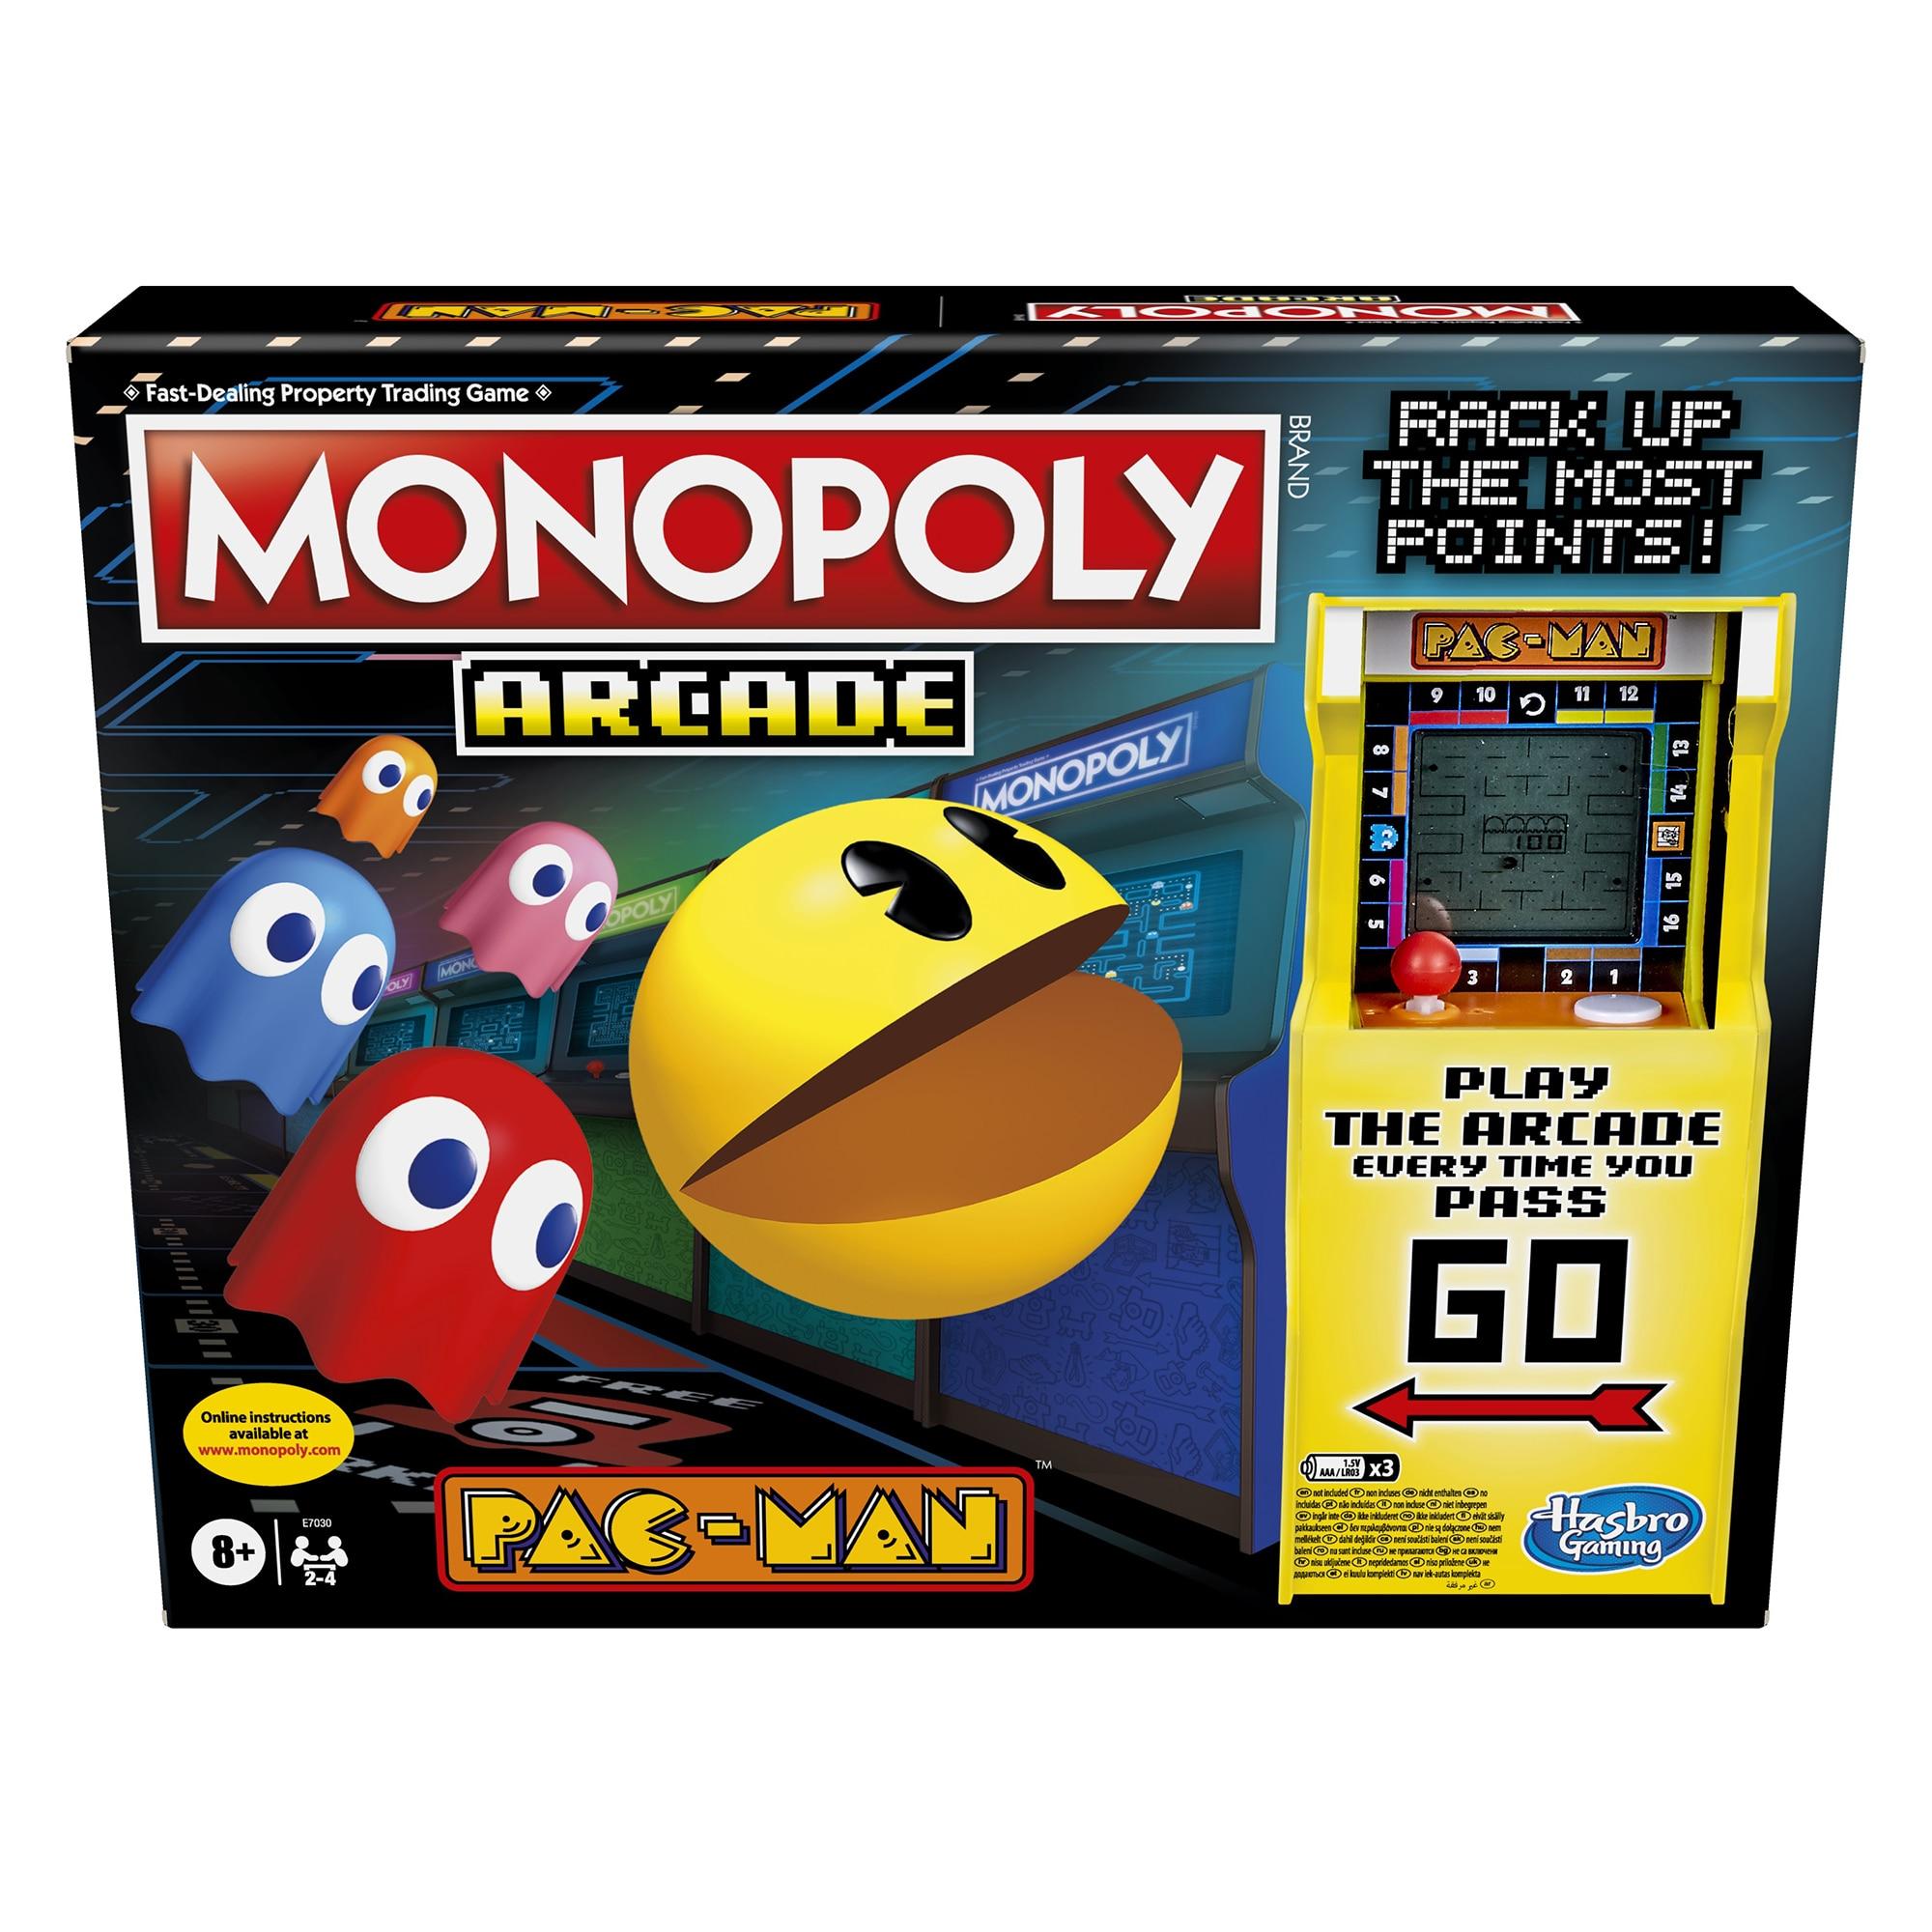 Joc - Monopoly - Arcade Pac-Man | Hasbro - 2